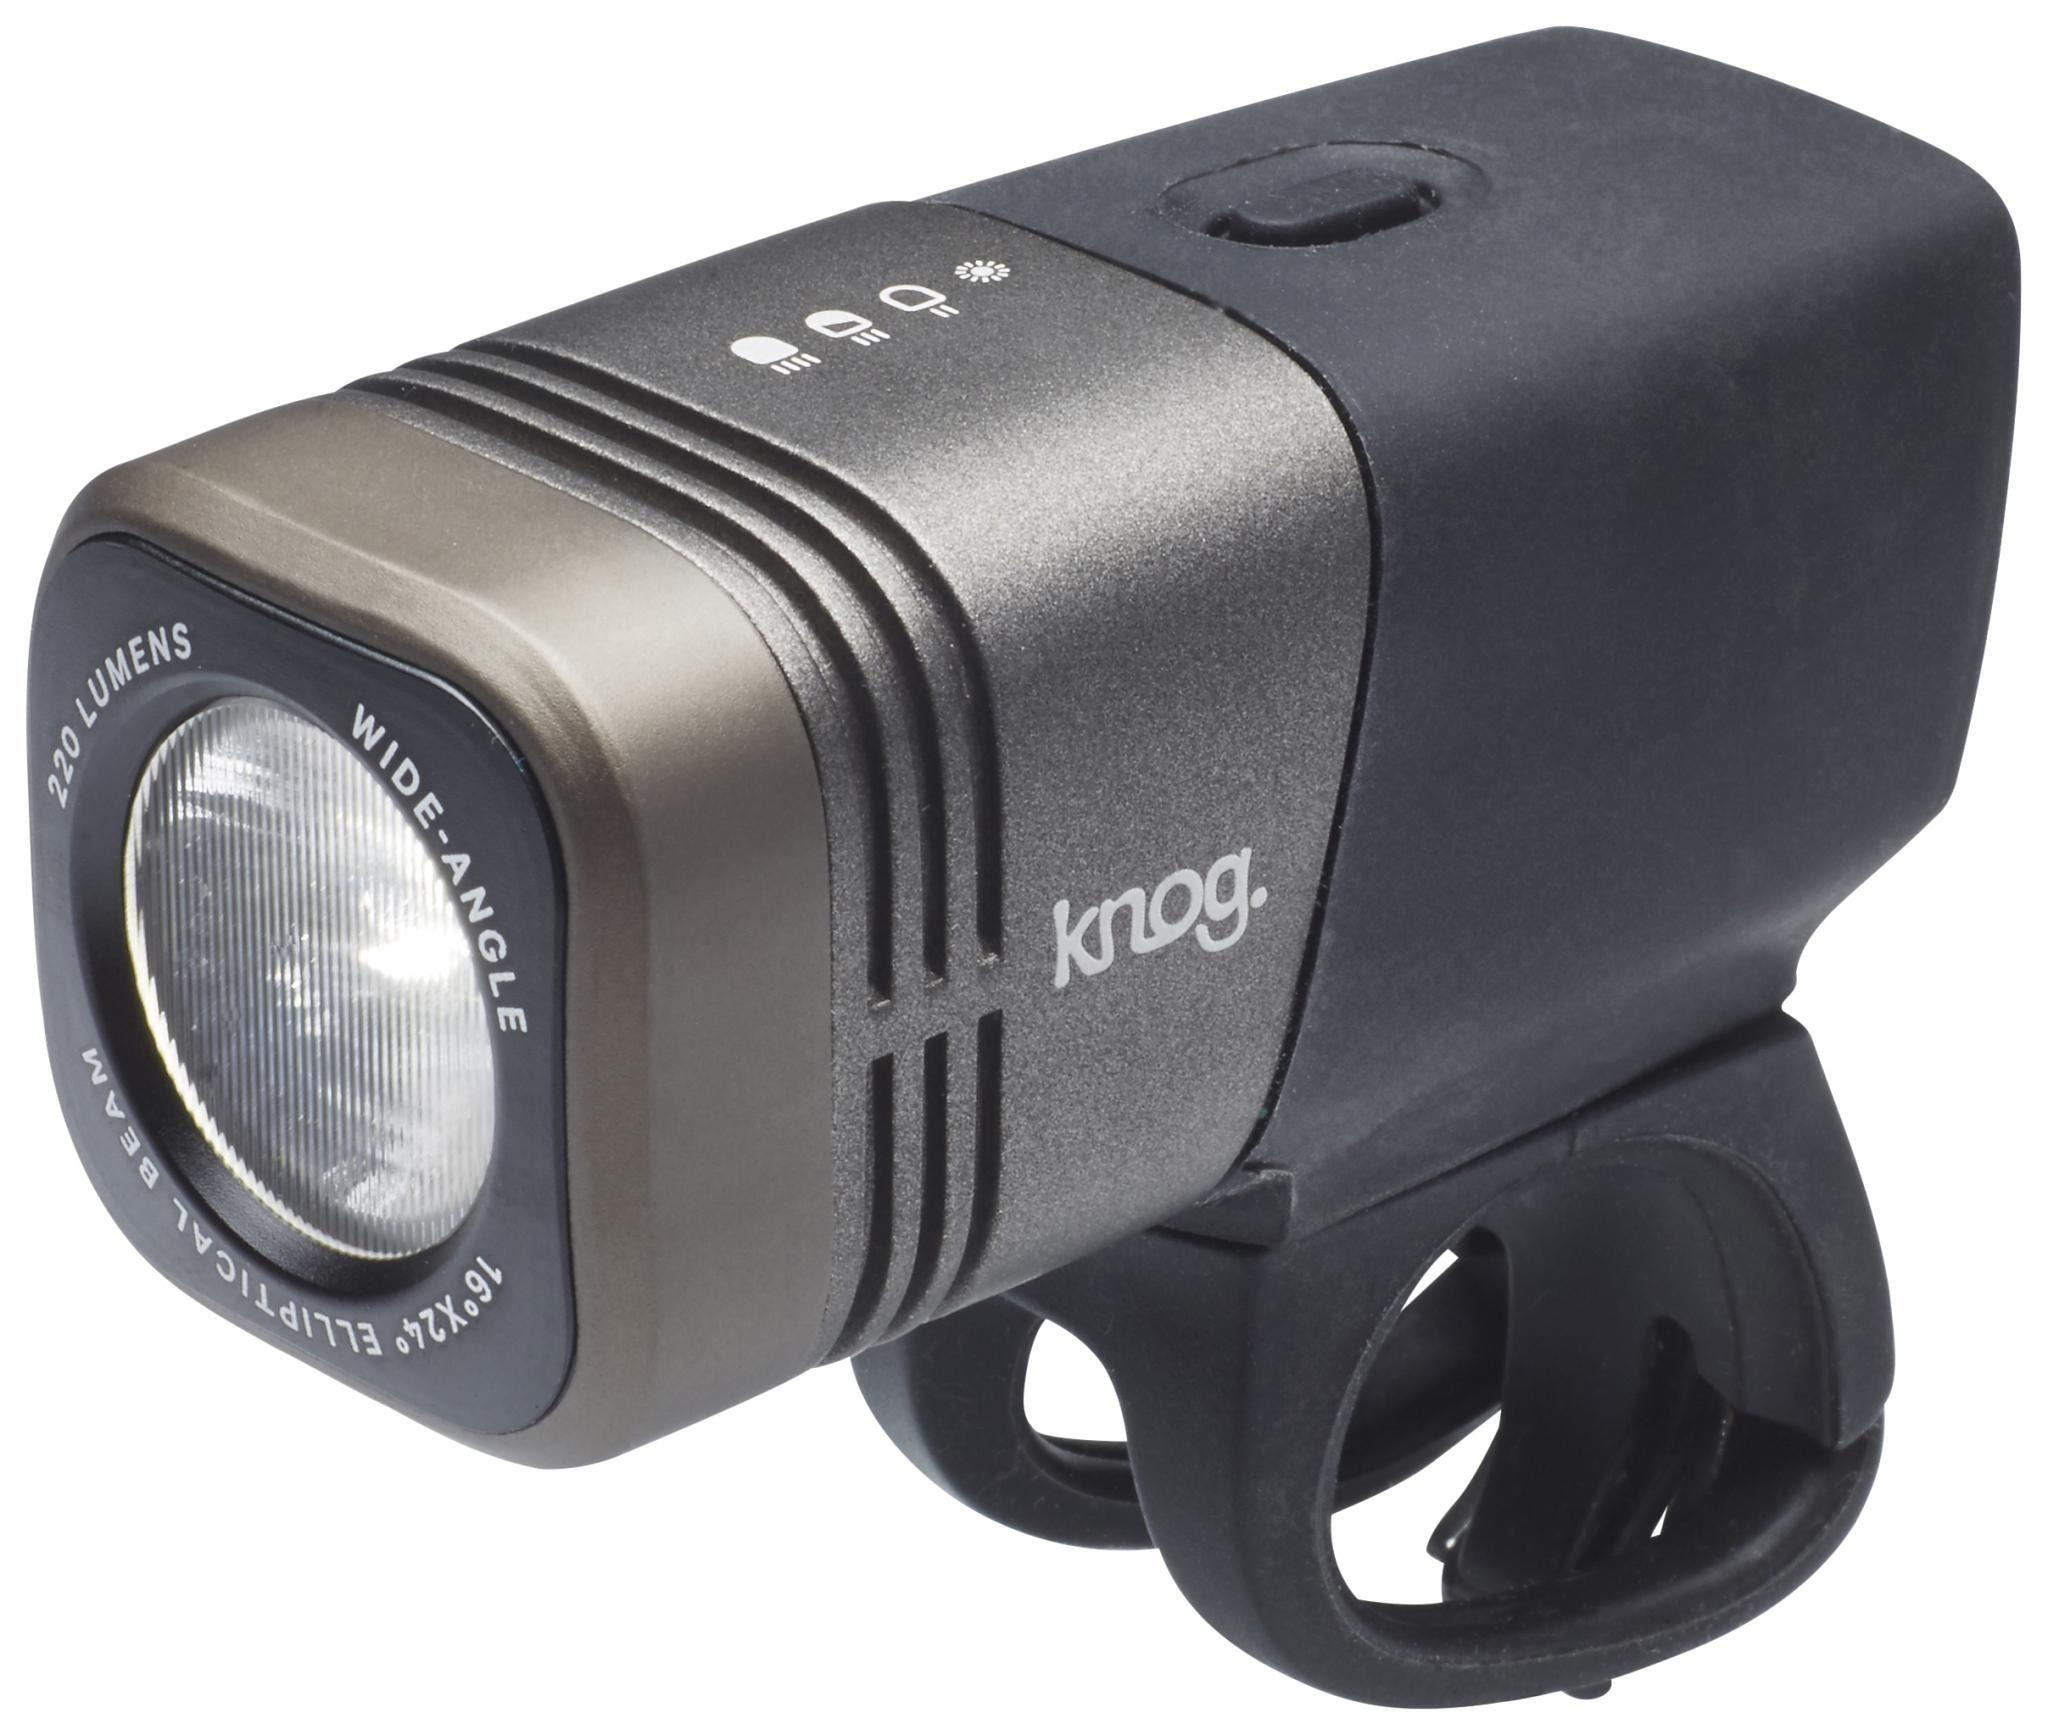 Knog Fahrradbeleuchtung »Blinder ARC 220 Frontlicht weiße LED«